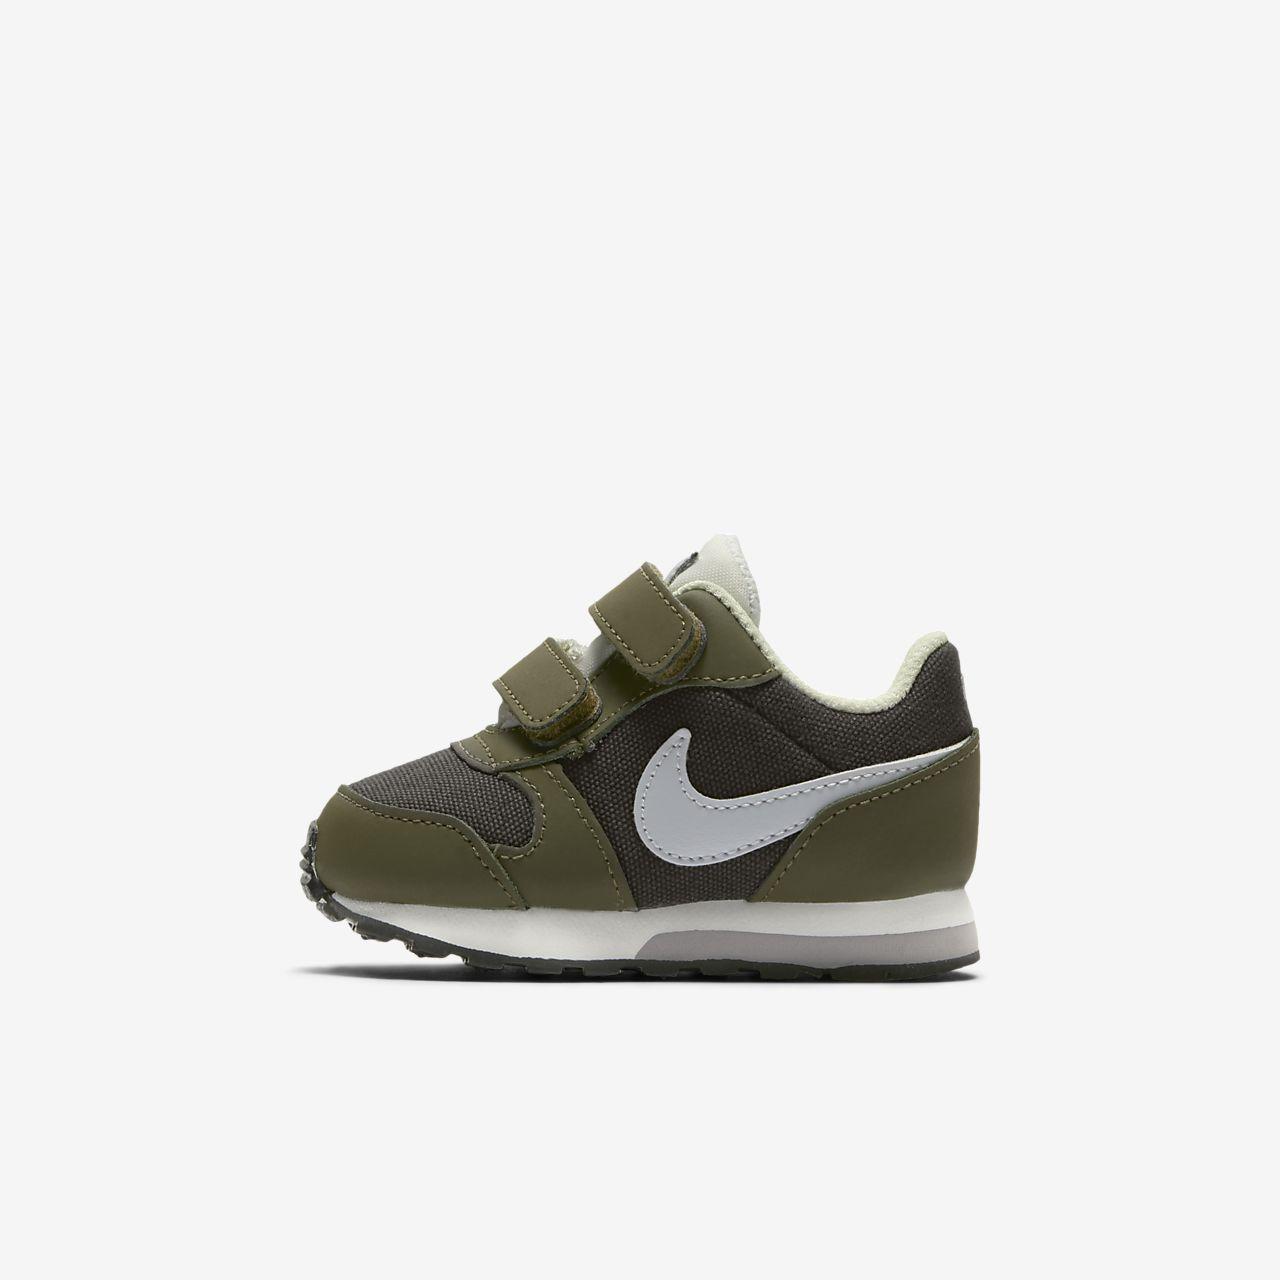 new arrival aa86a 40e12 Nike MD Runner 2 Schuh für Kleinkinder